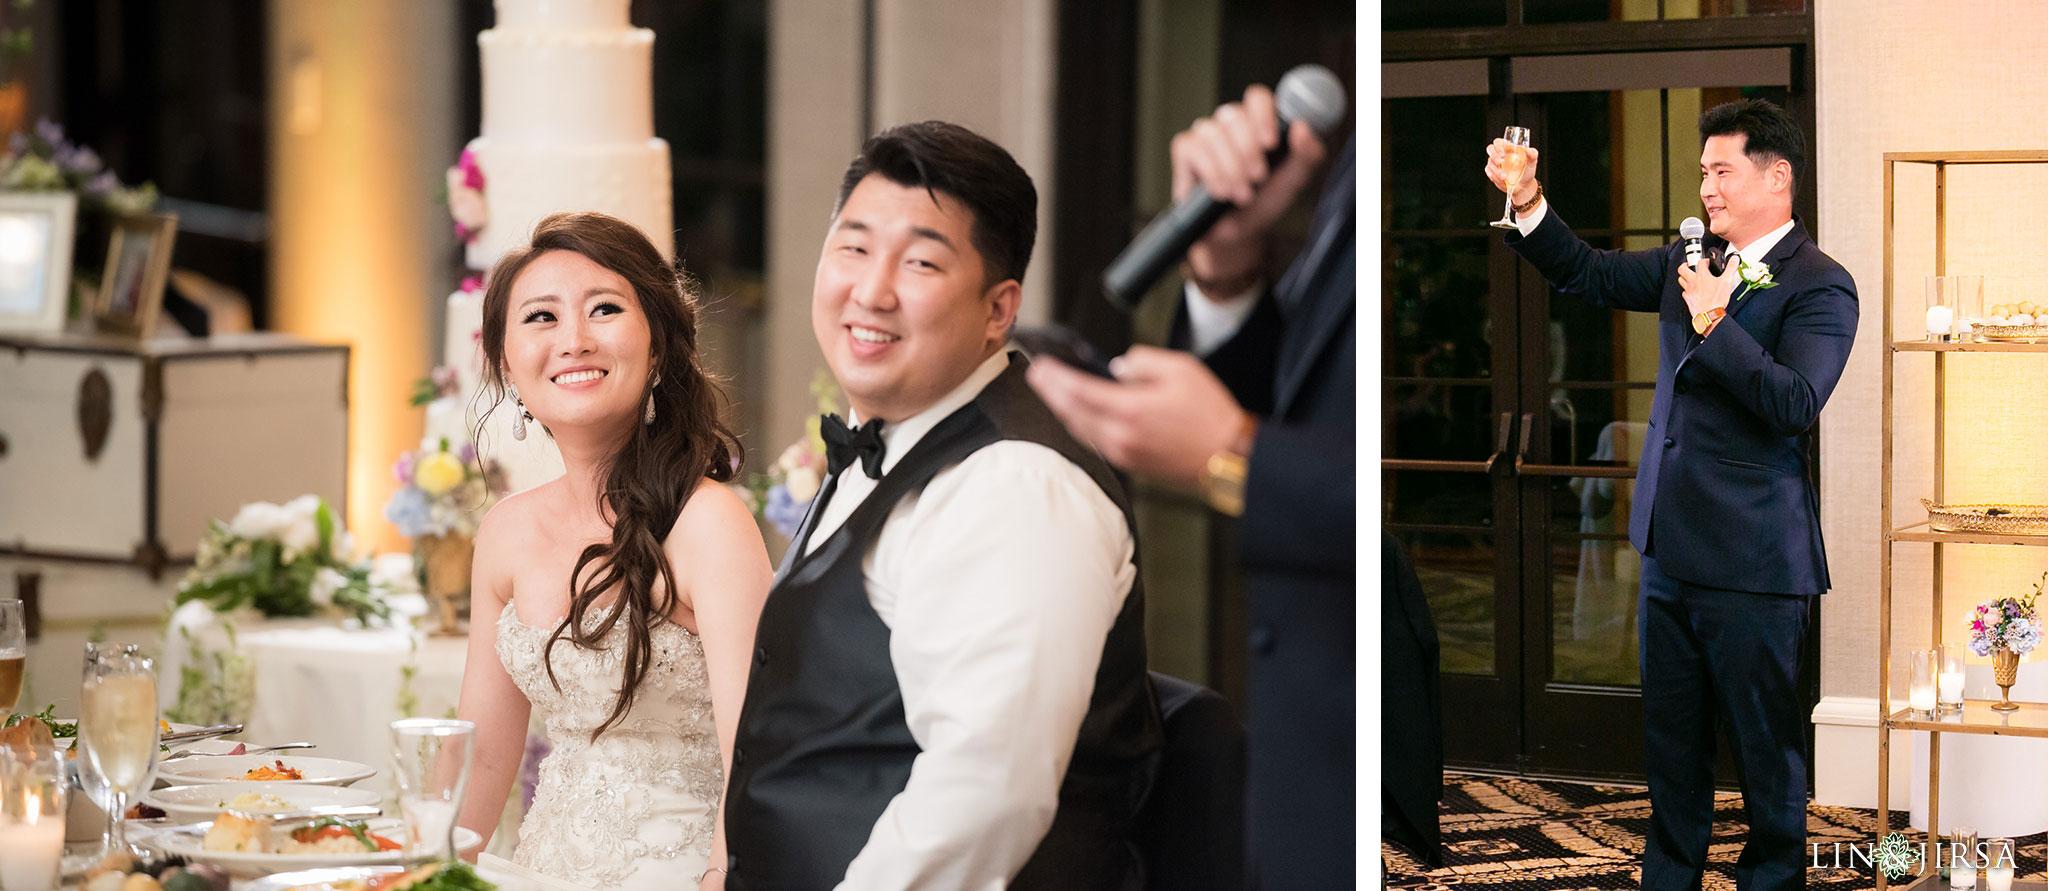 32 trump national golf club rancho palos verdes wedding reception photography